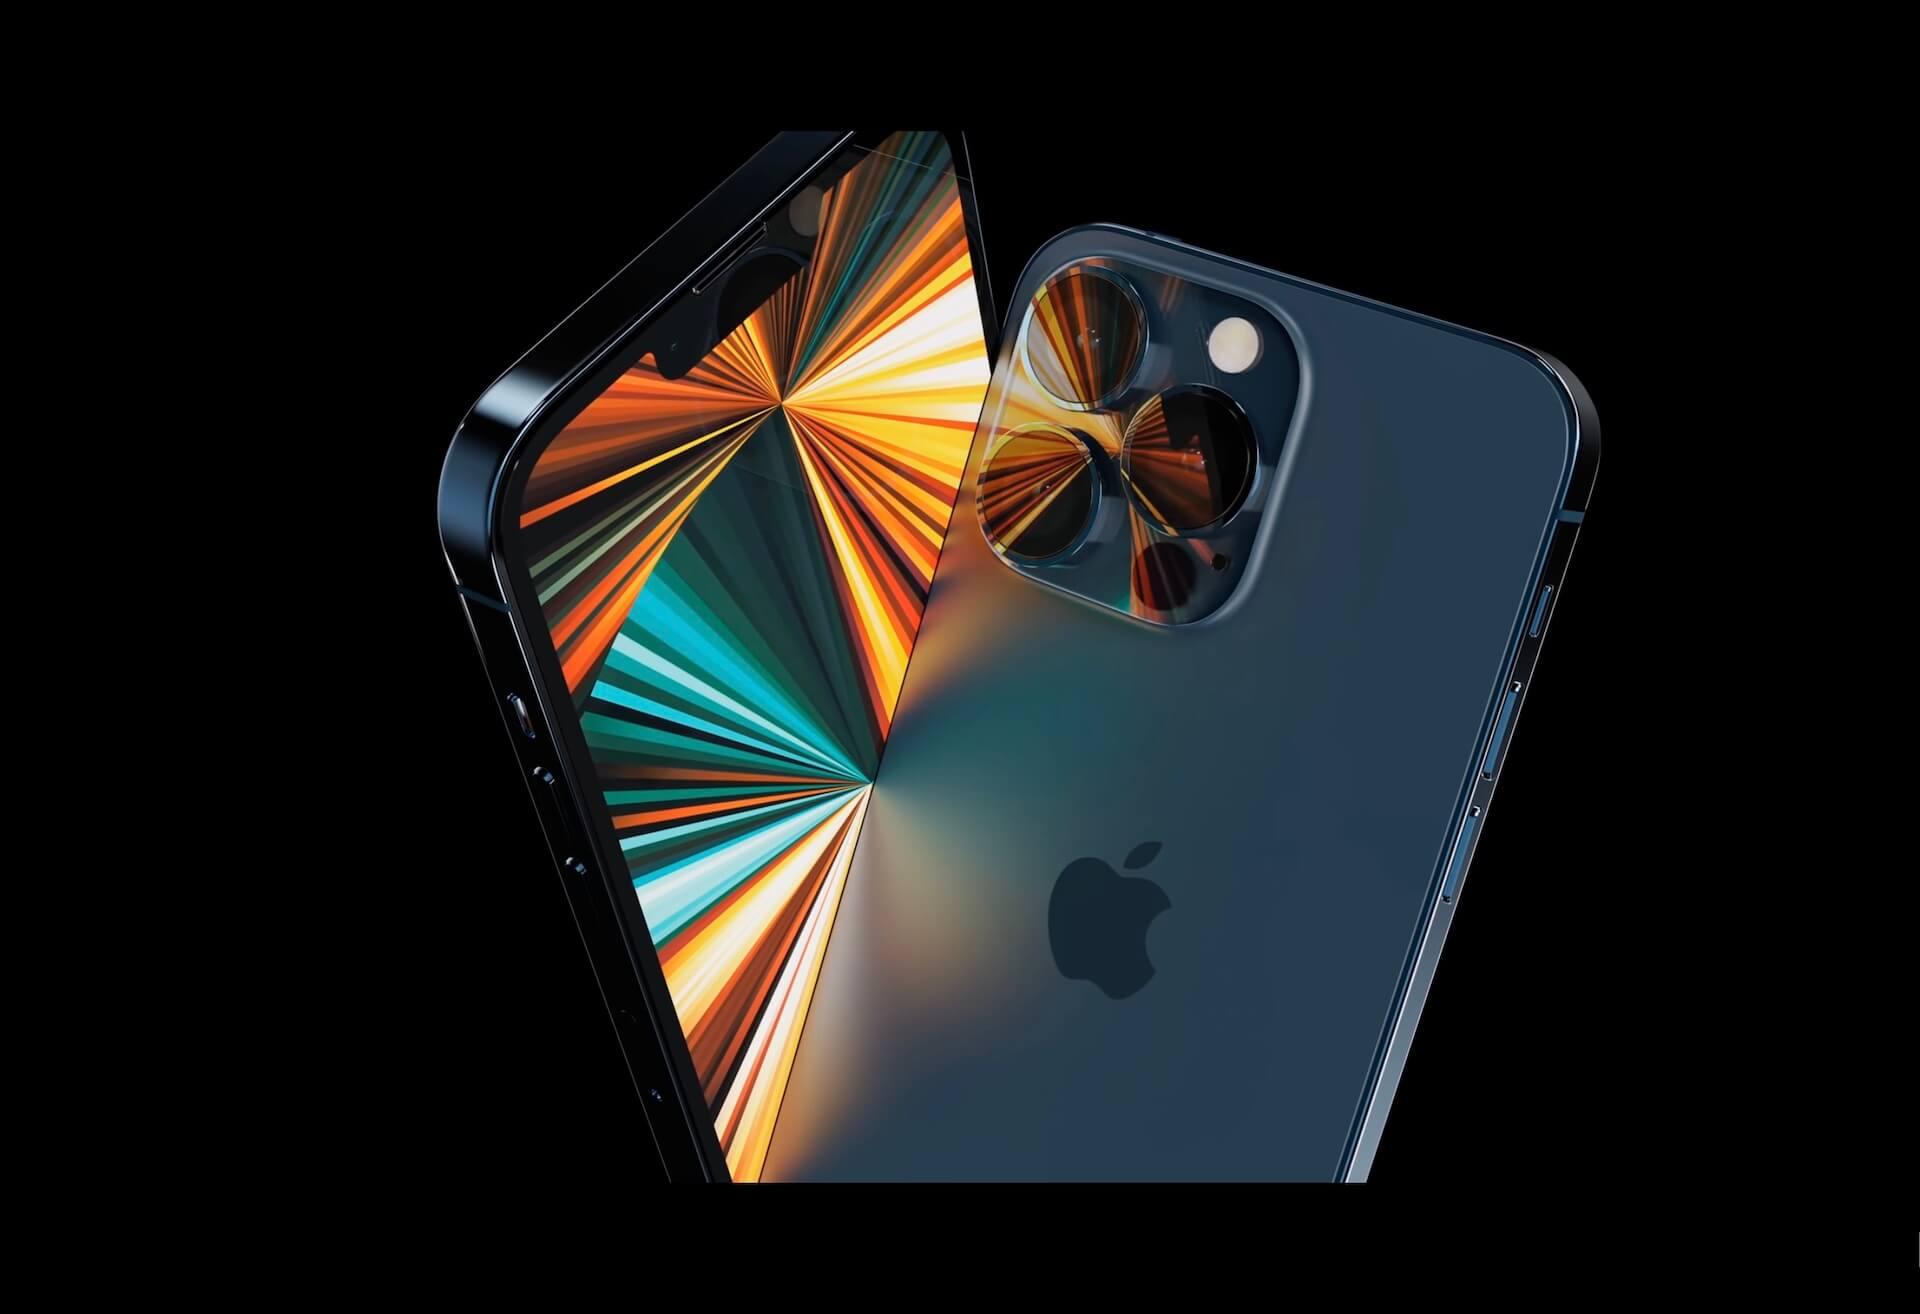 iPhone 13に採用されるA15チップの製造がついにスタート?今年後半発表か tech210526_iphone13_main